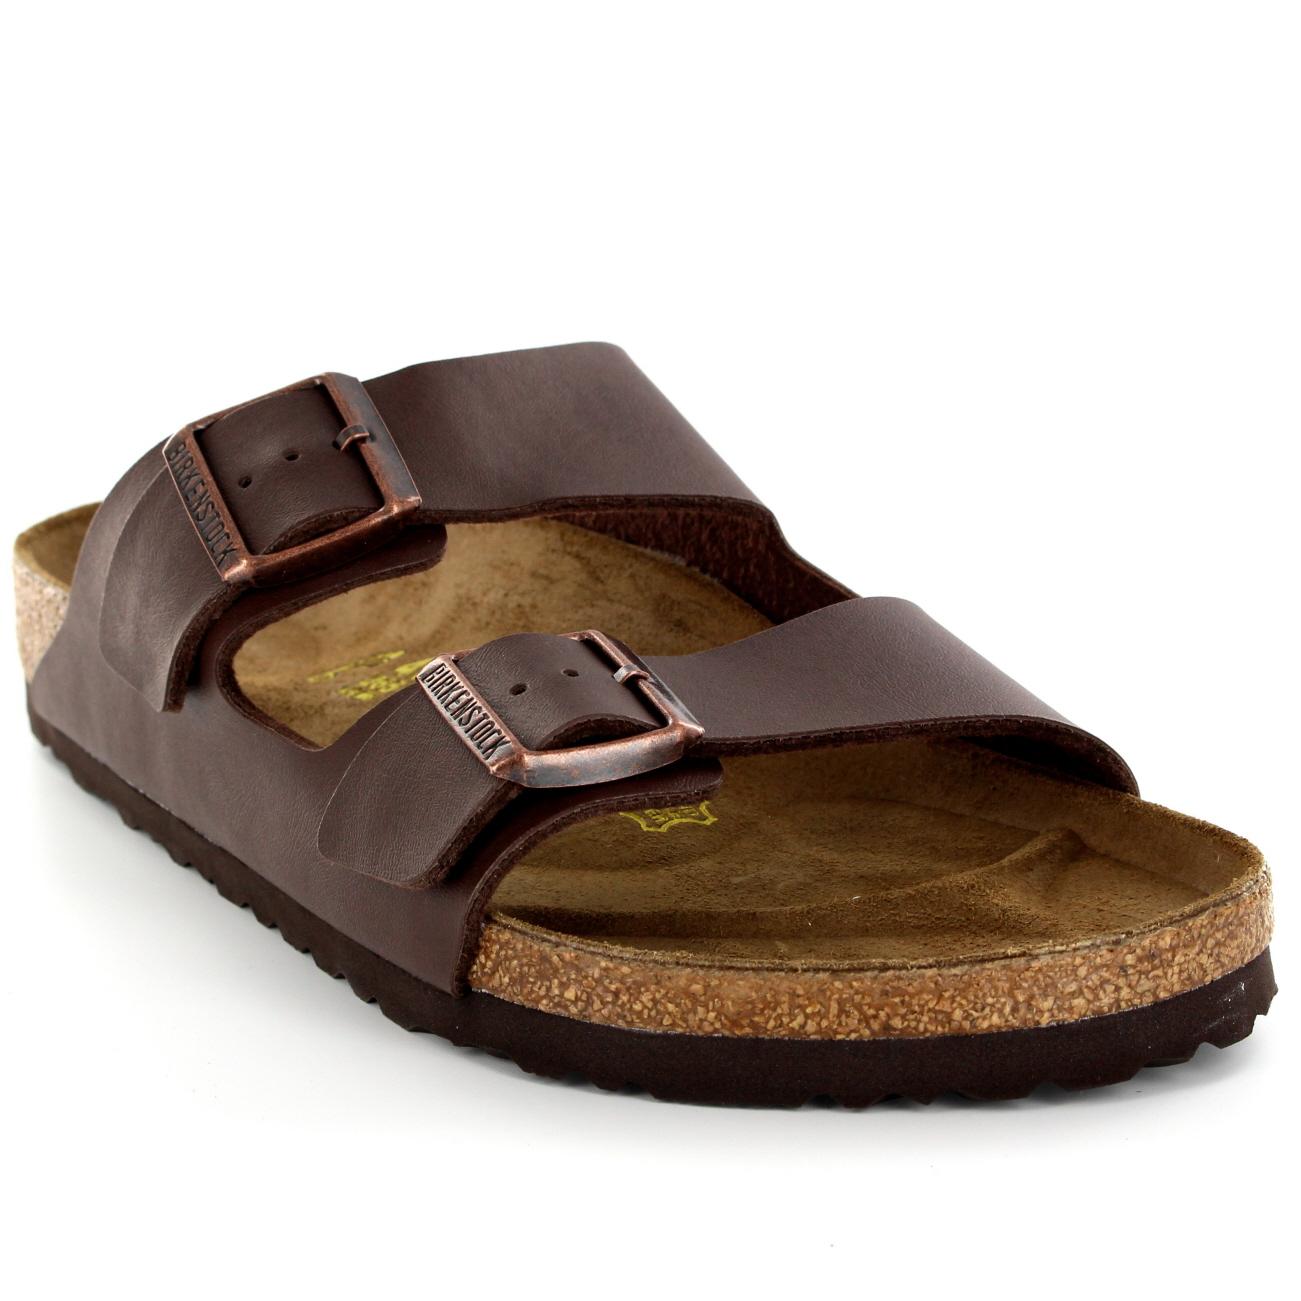 ab2bf75480 Mens Birkenstock Arizona Leather Buckle Summer Holiday Beach Sandals ...